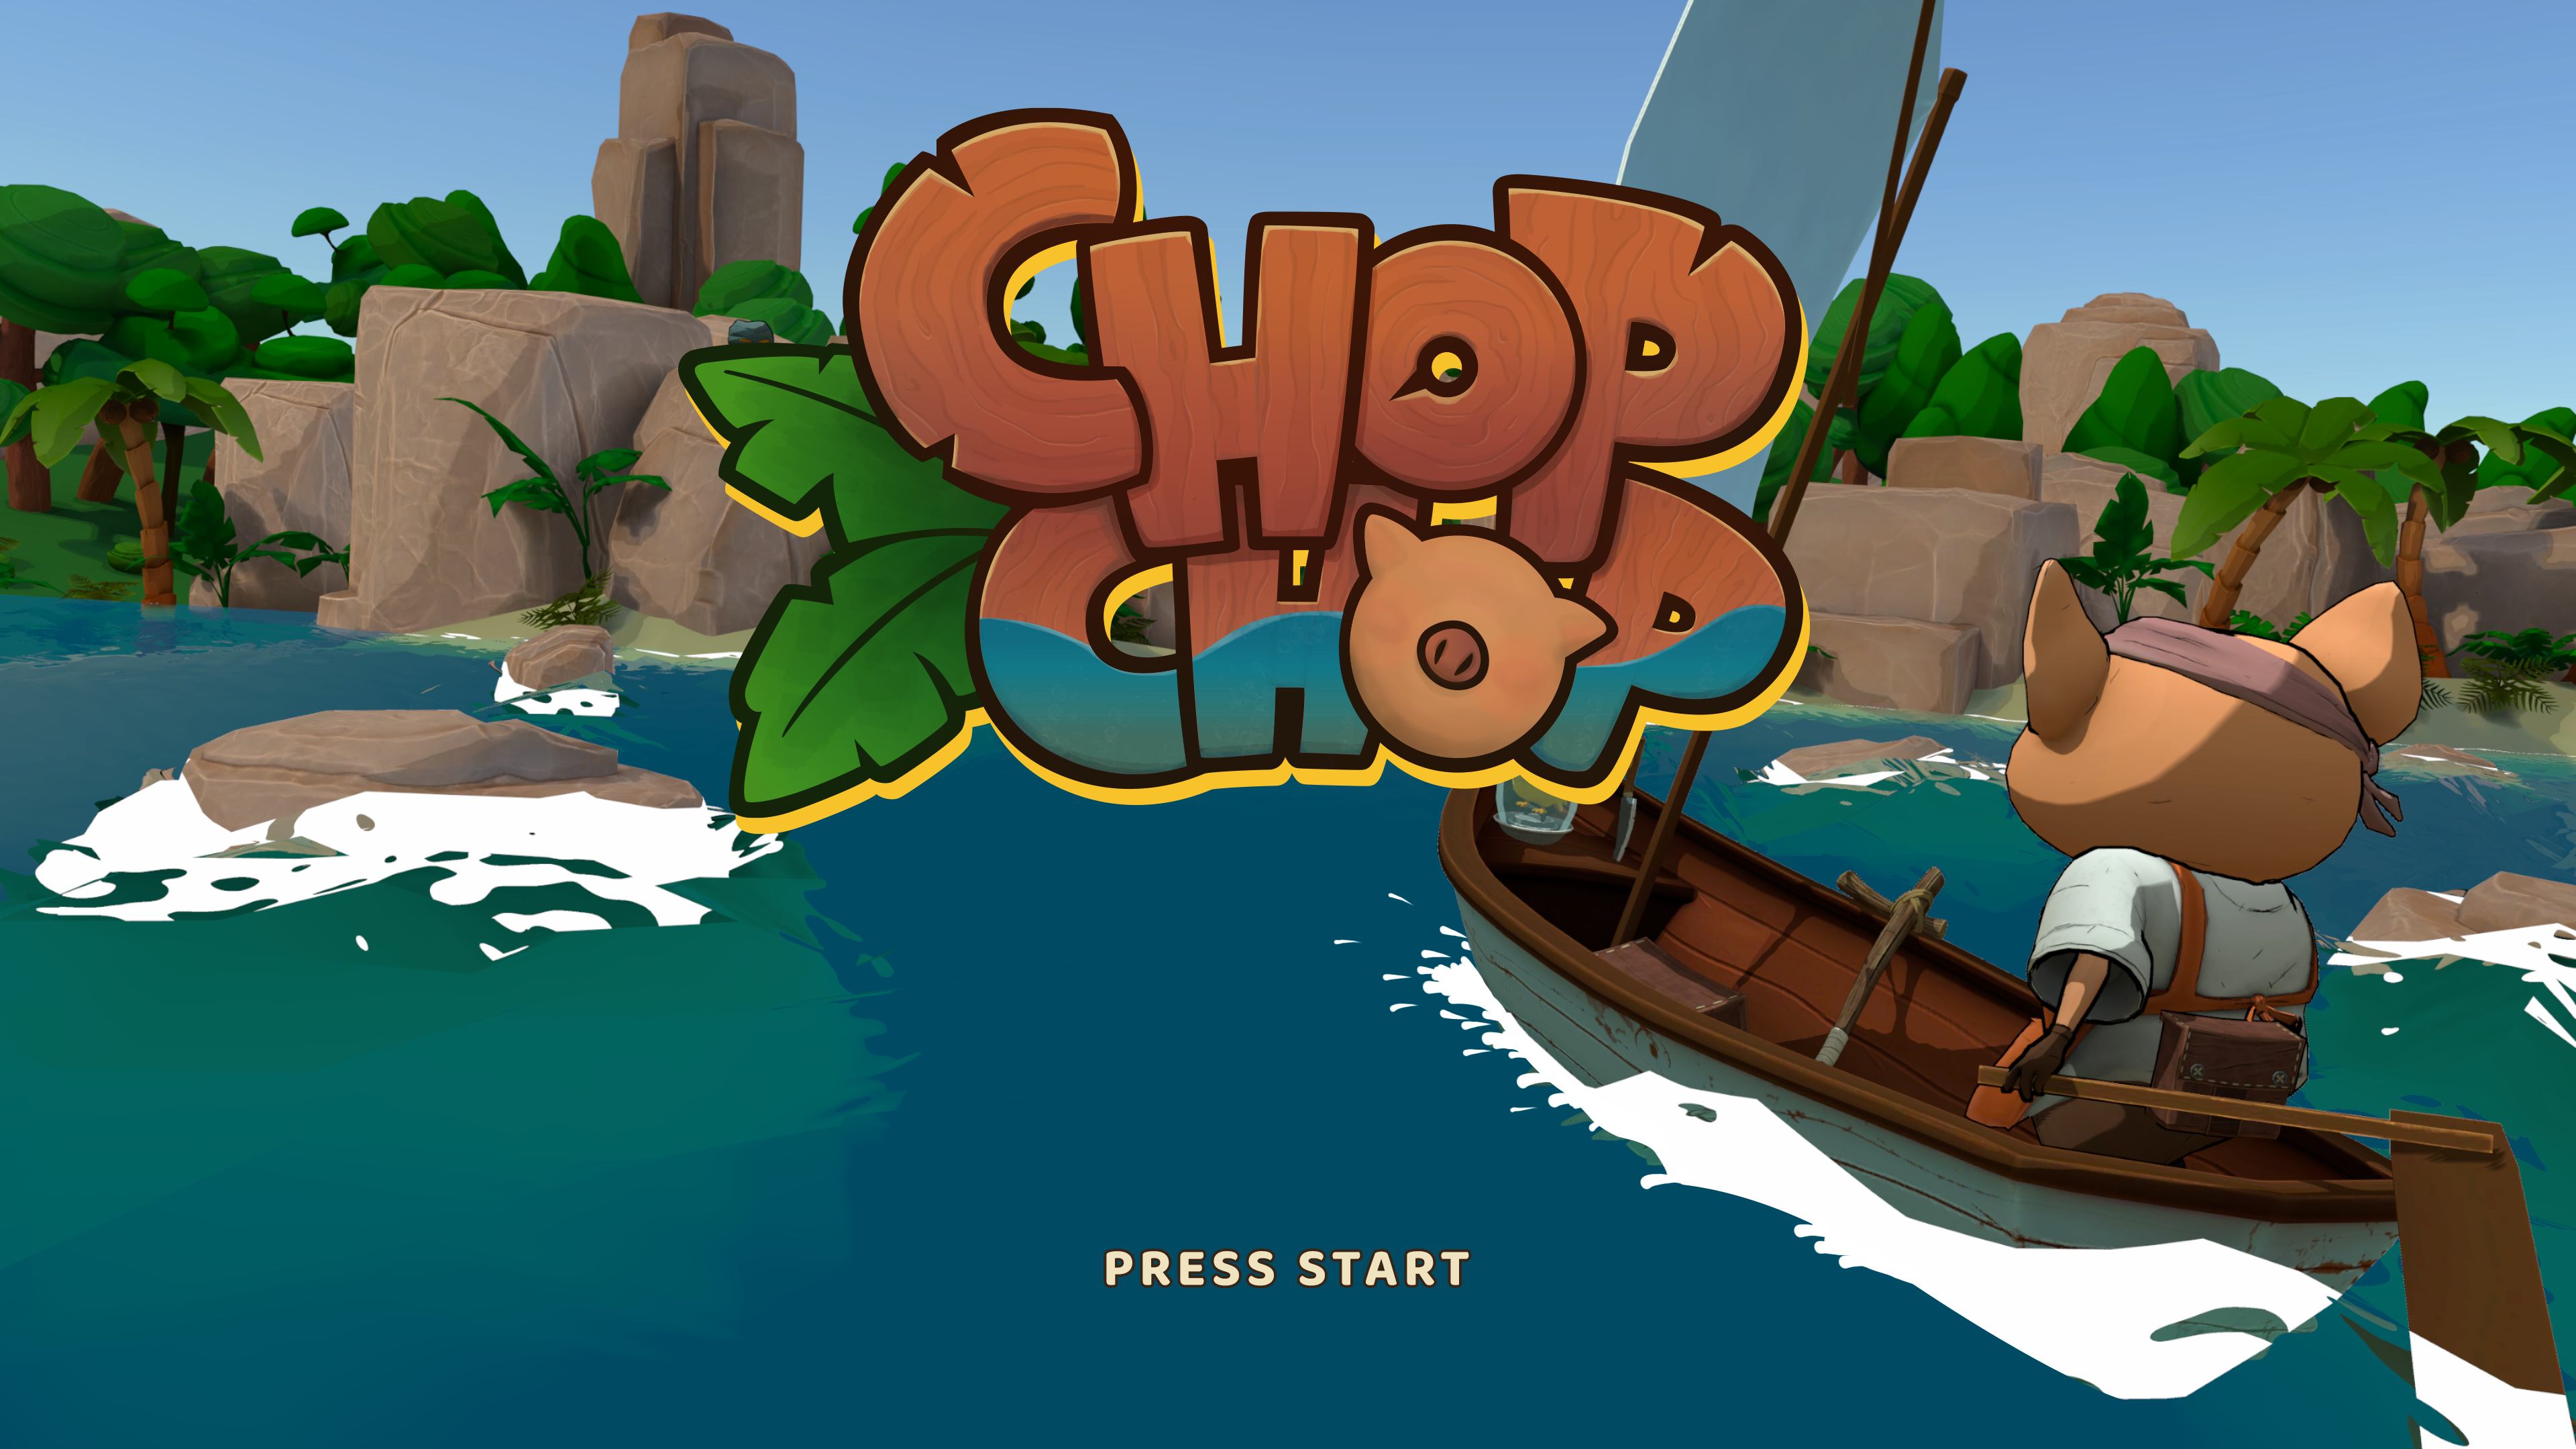 ChopChopLogo_01.png